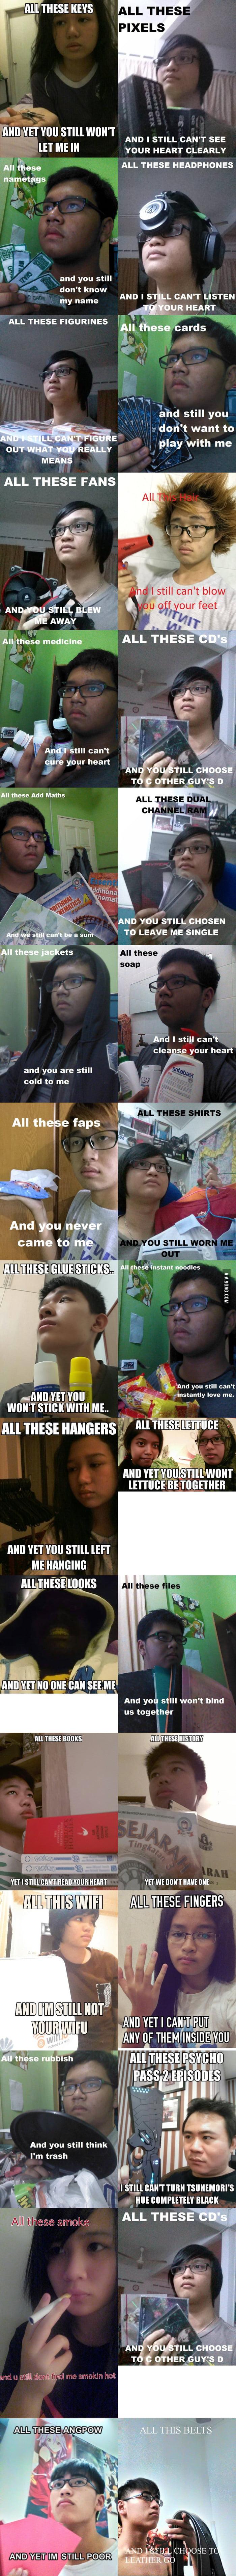 abyq6yO_700b all these memes 9gag,All These Memes